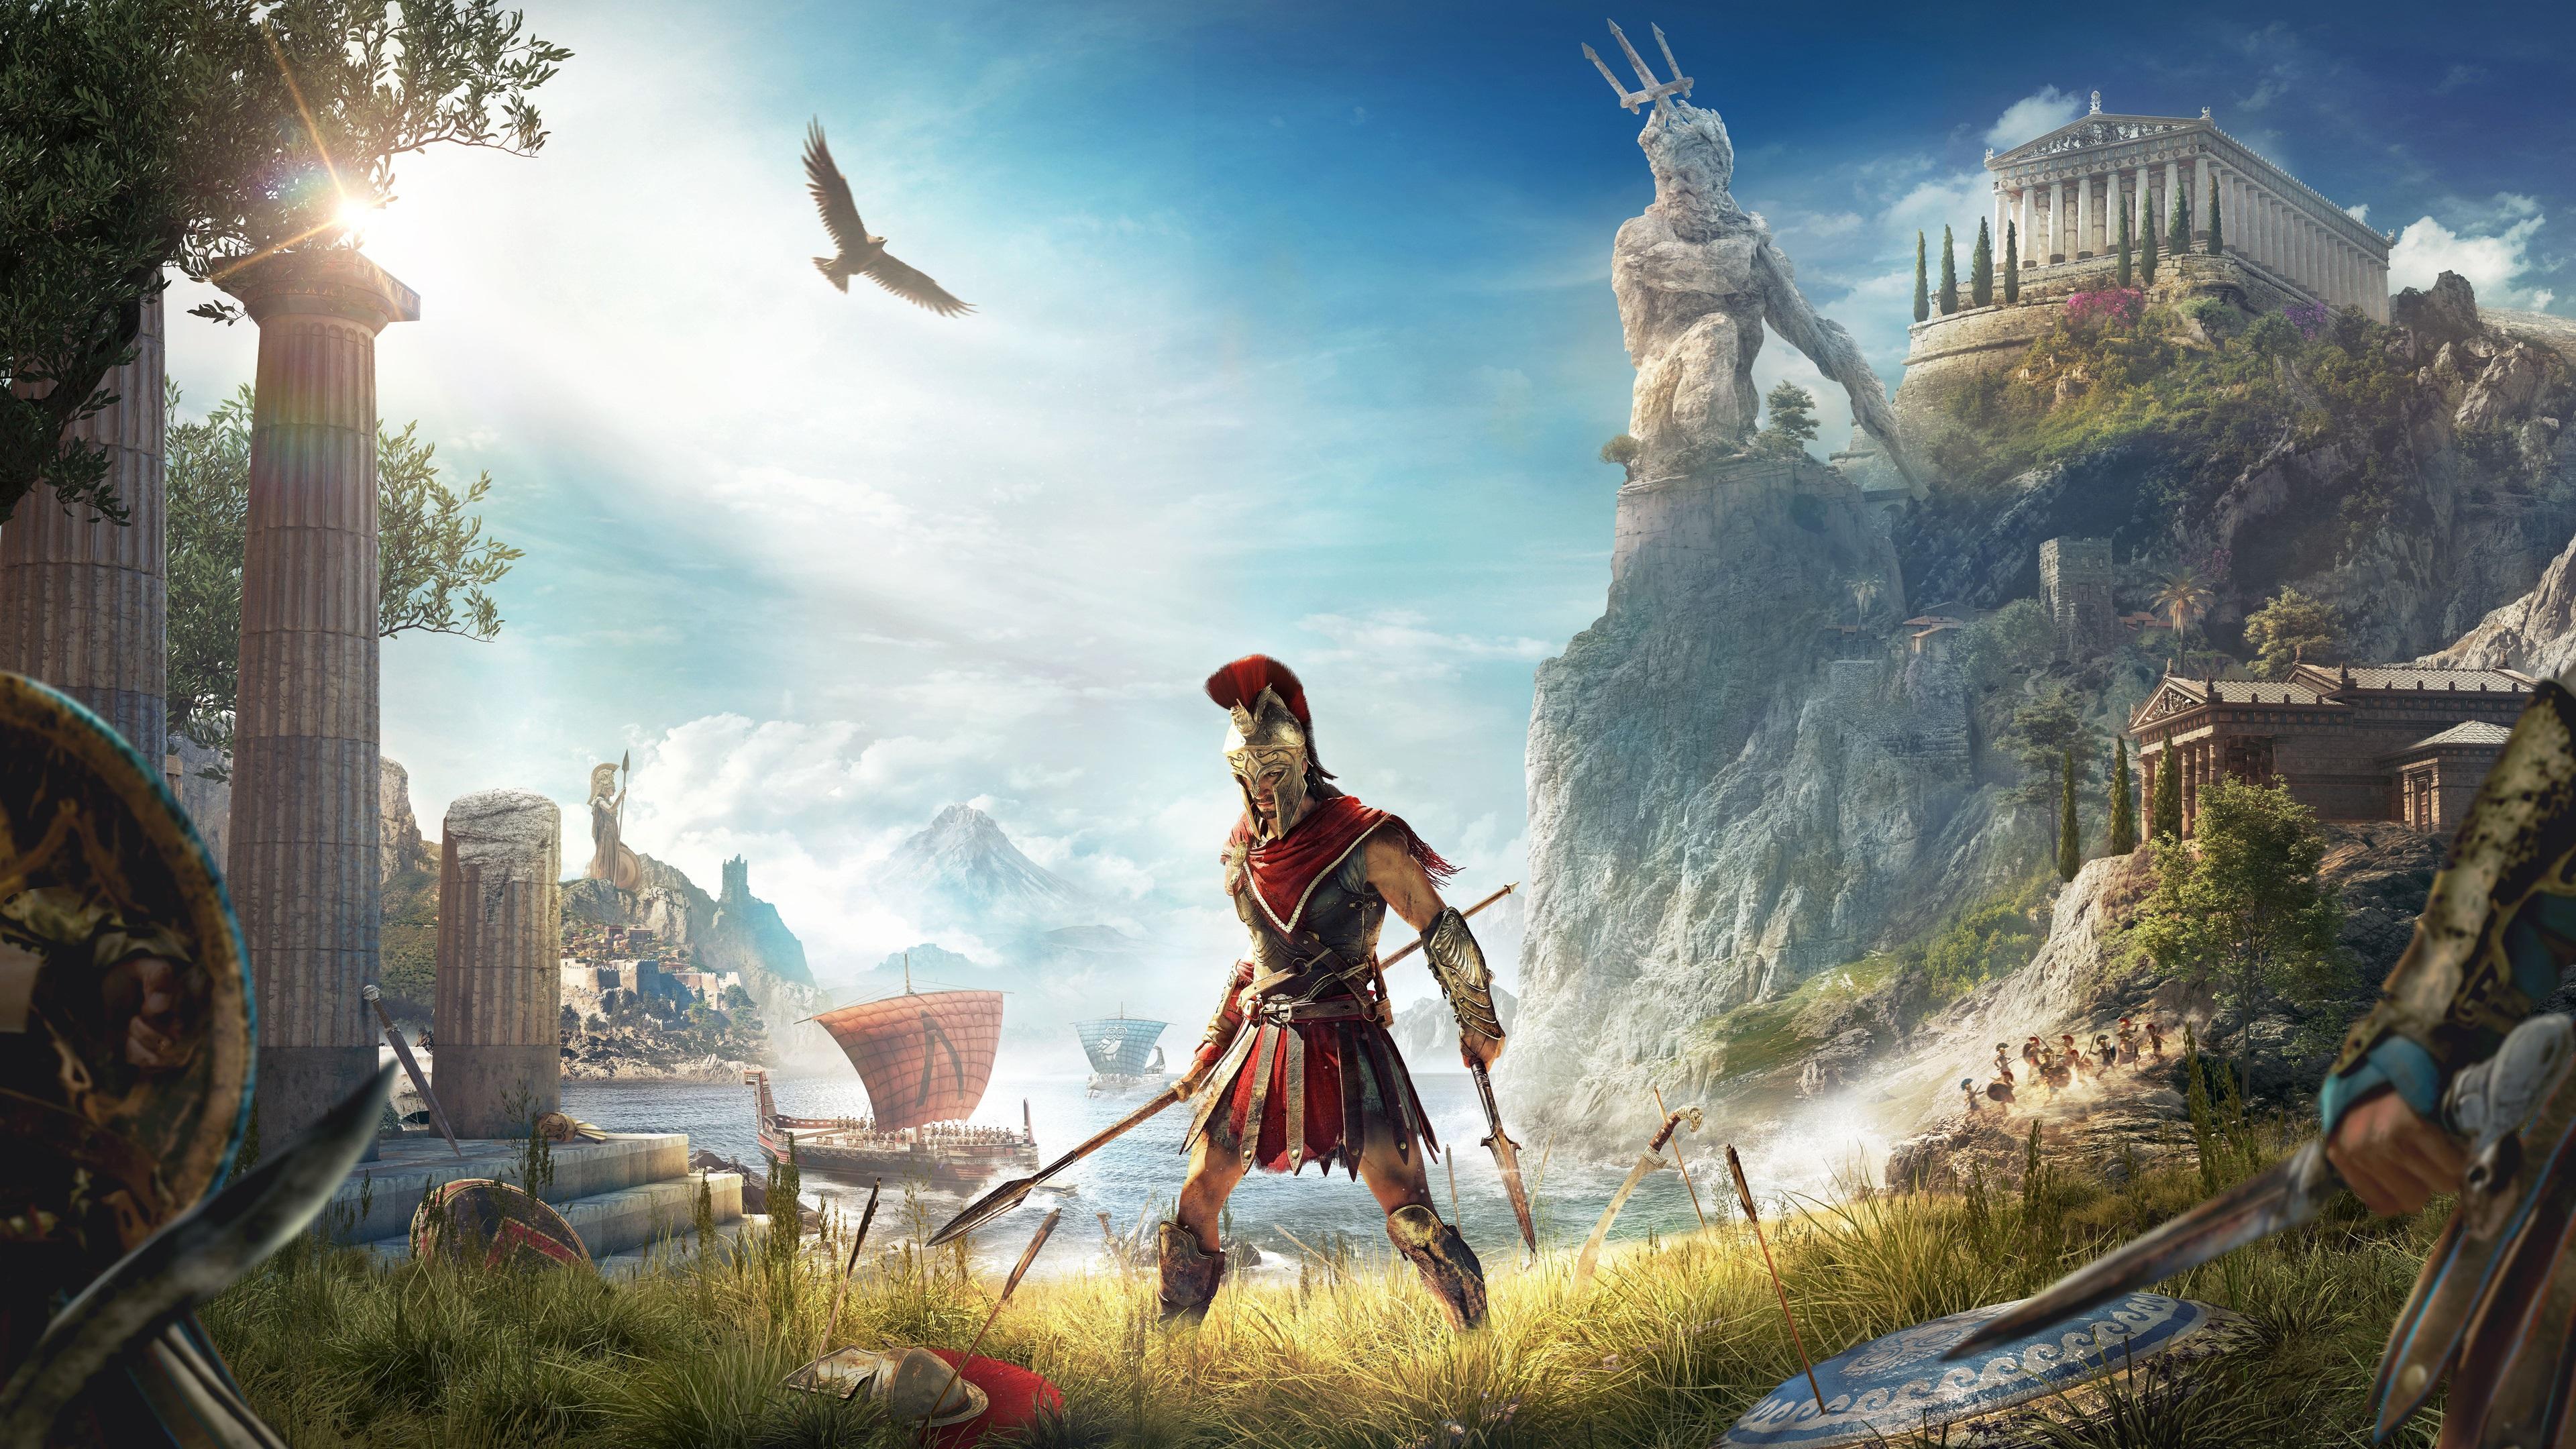 Wallpaper Assassin's Creed: Odyssey, E3 2018 3840x2160 UHD